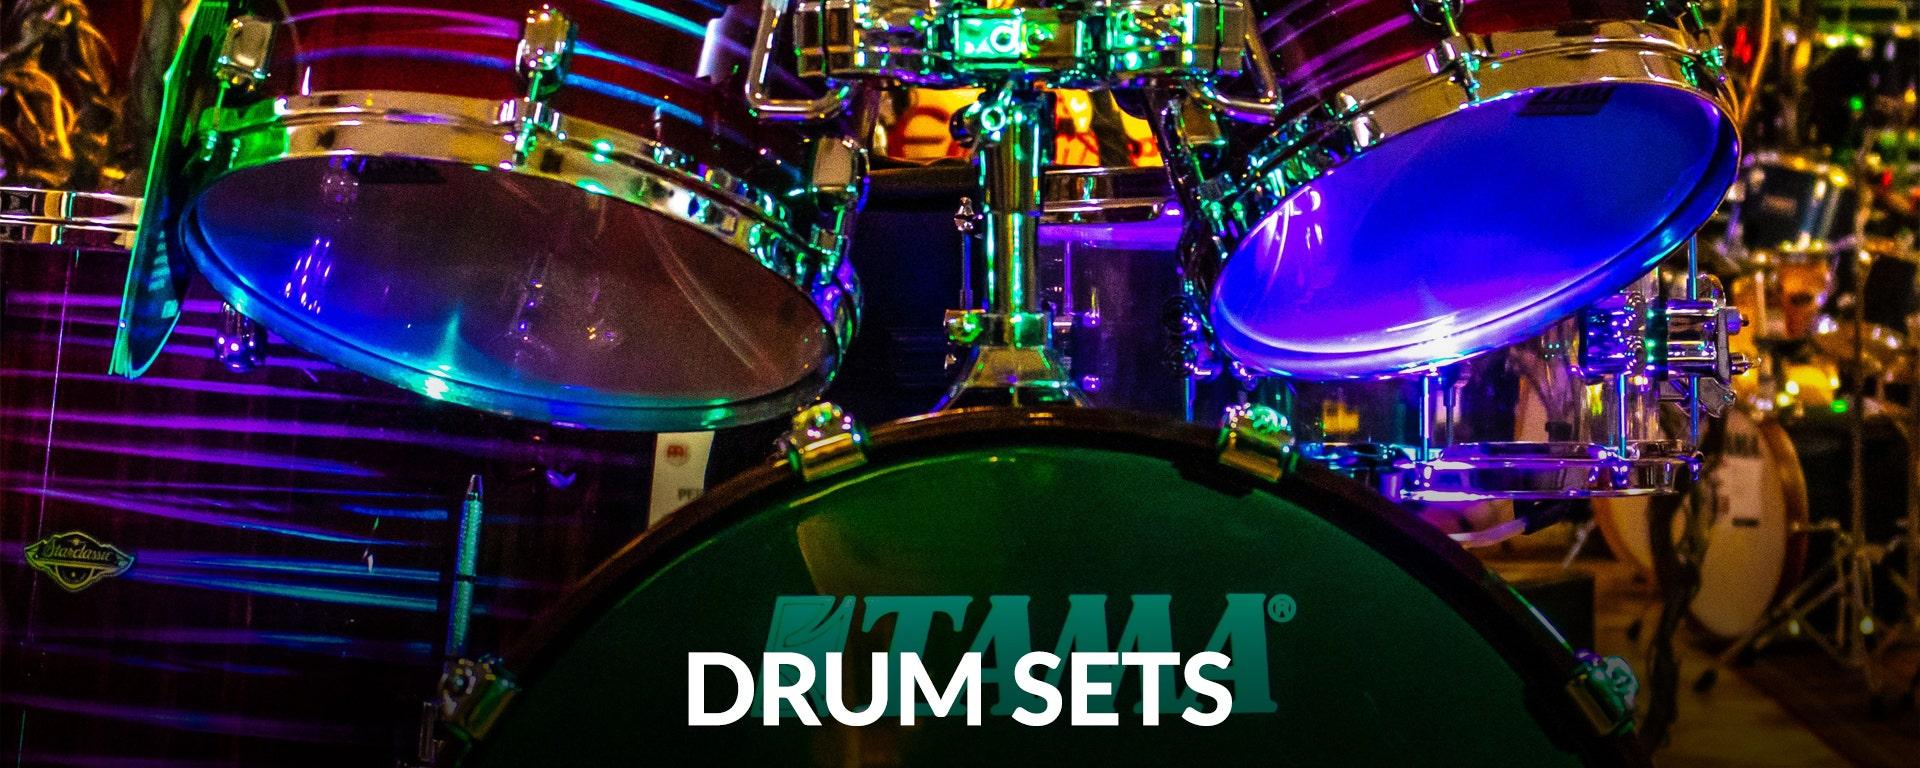 Drum Sets At Samash.com